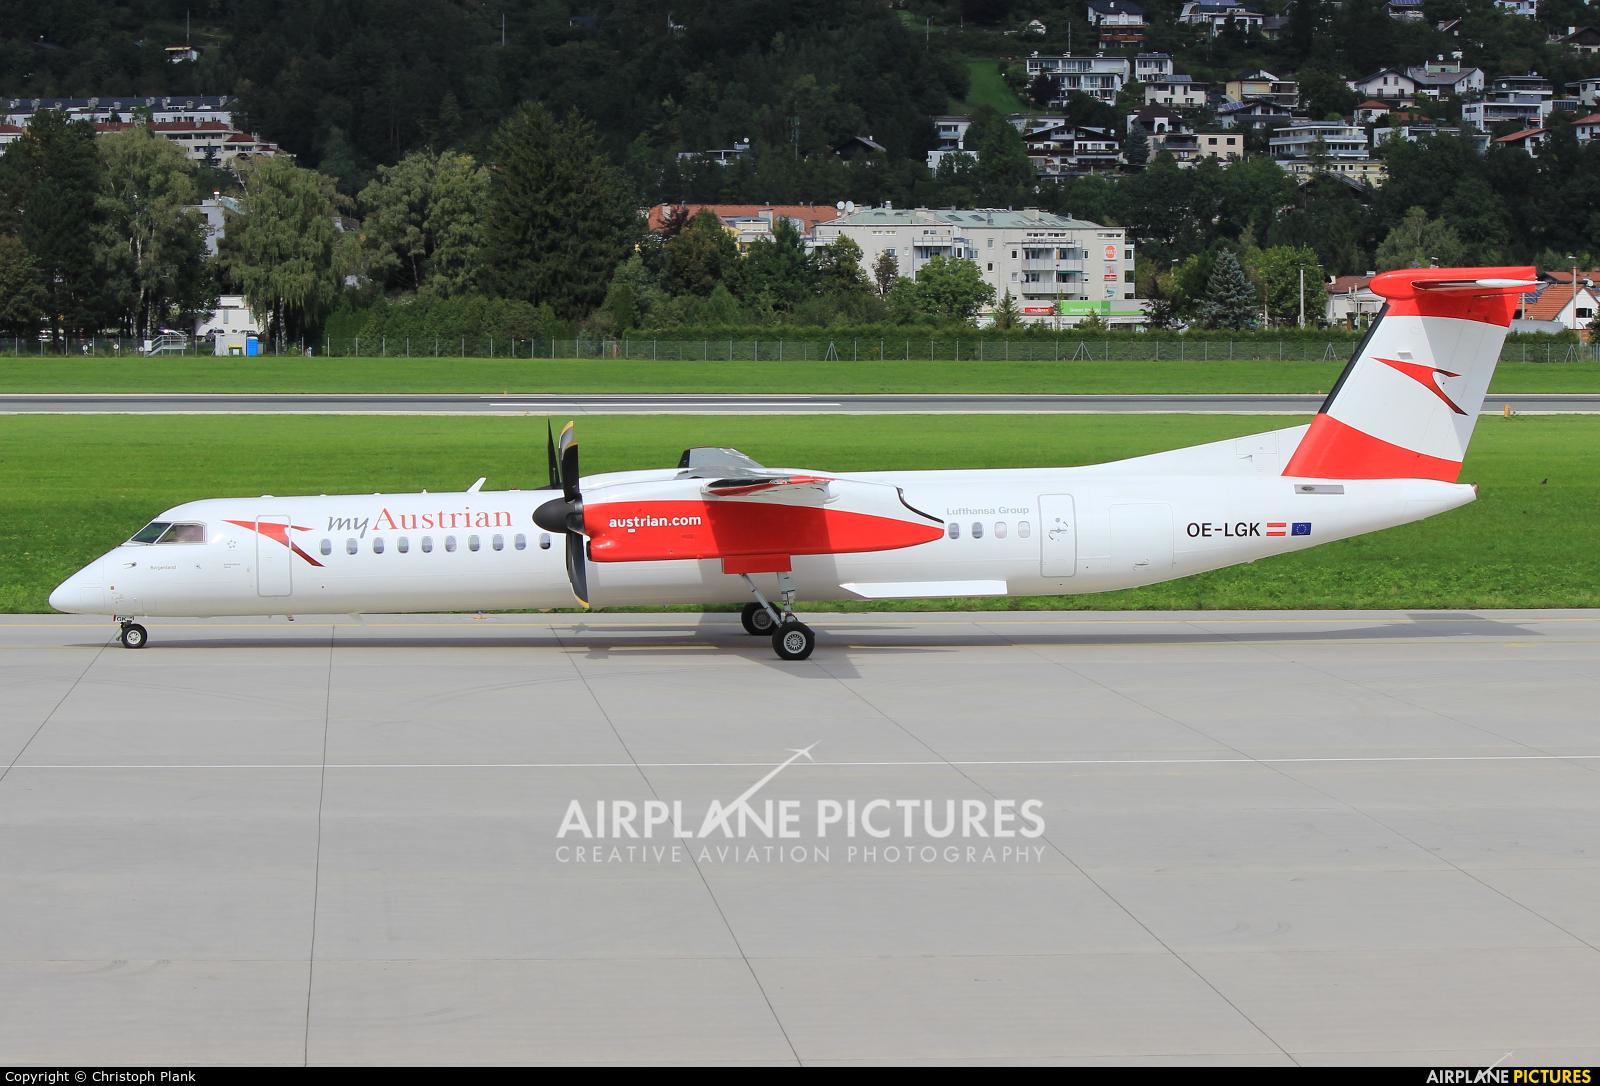 Austrian Airlines/Arrows/Tyrolean OE-LGK aircraft at Innsbruck